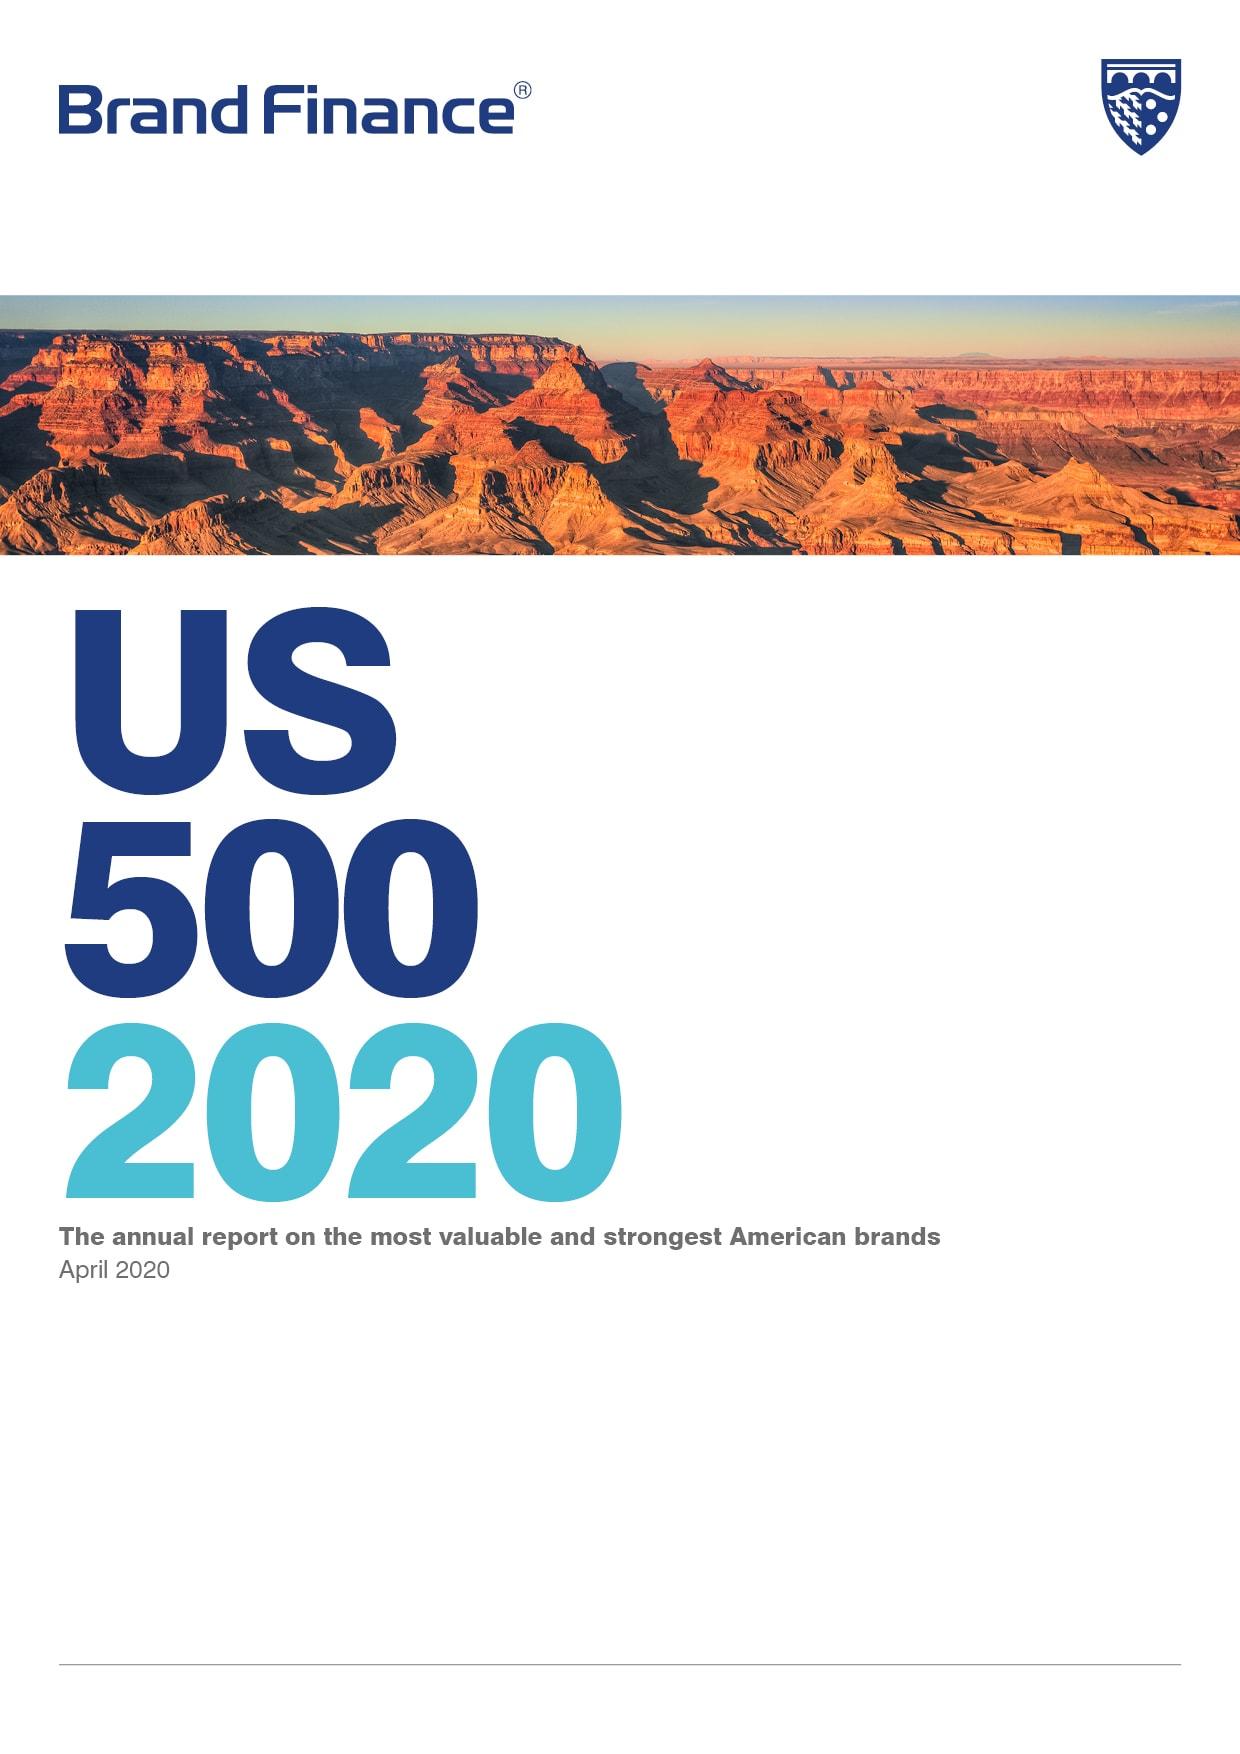 Brand Finance US 500 2020